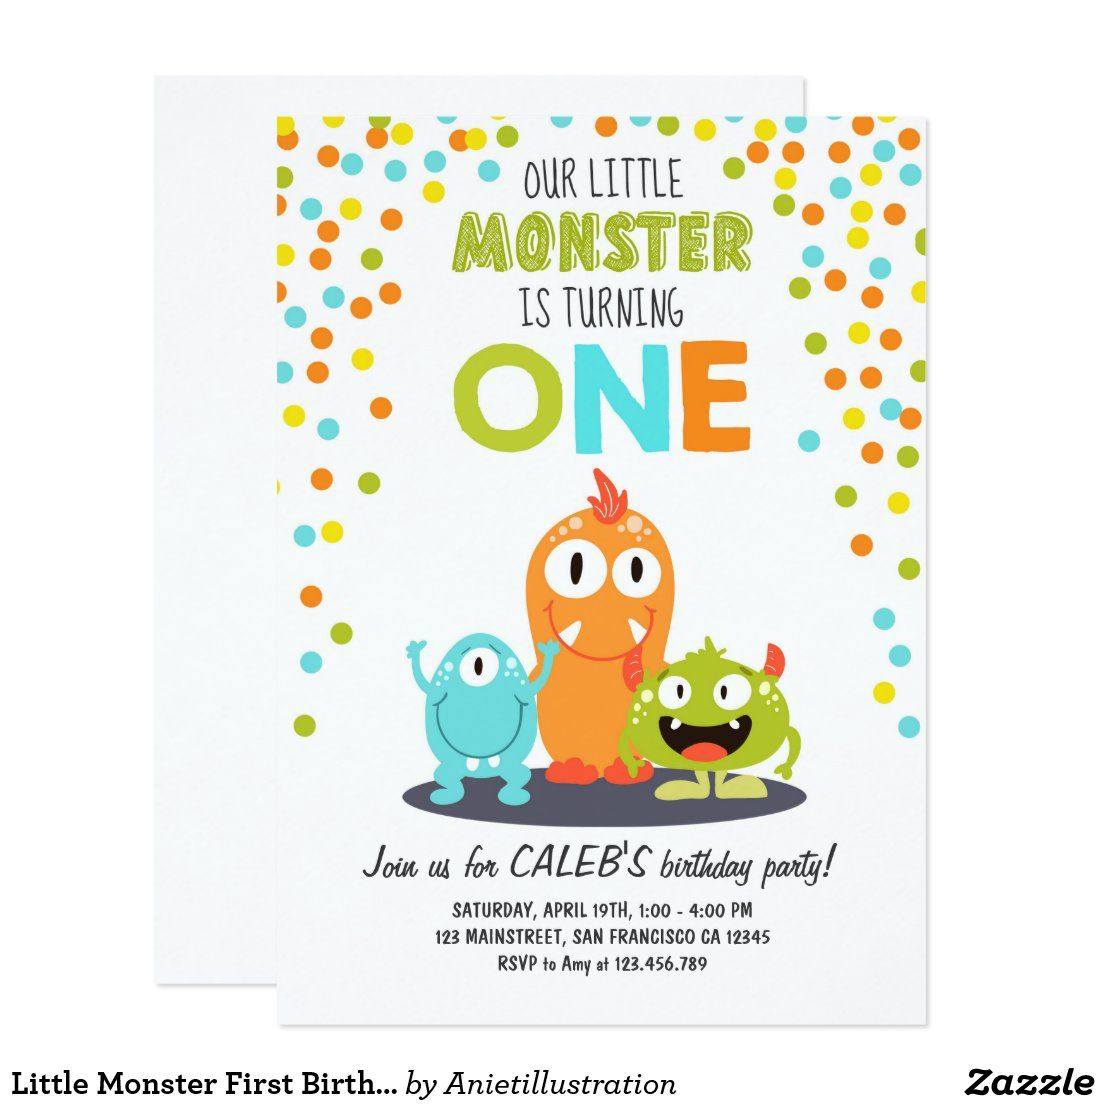 Fiestas De Halloween En San Francisco California 2020 Little Monster First Birthday Party Invitation Boy | Zazzle.en